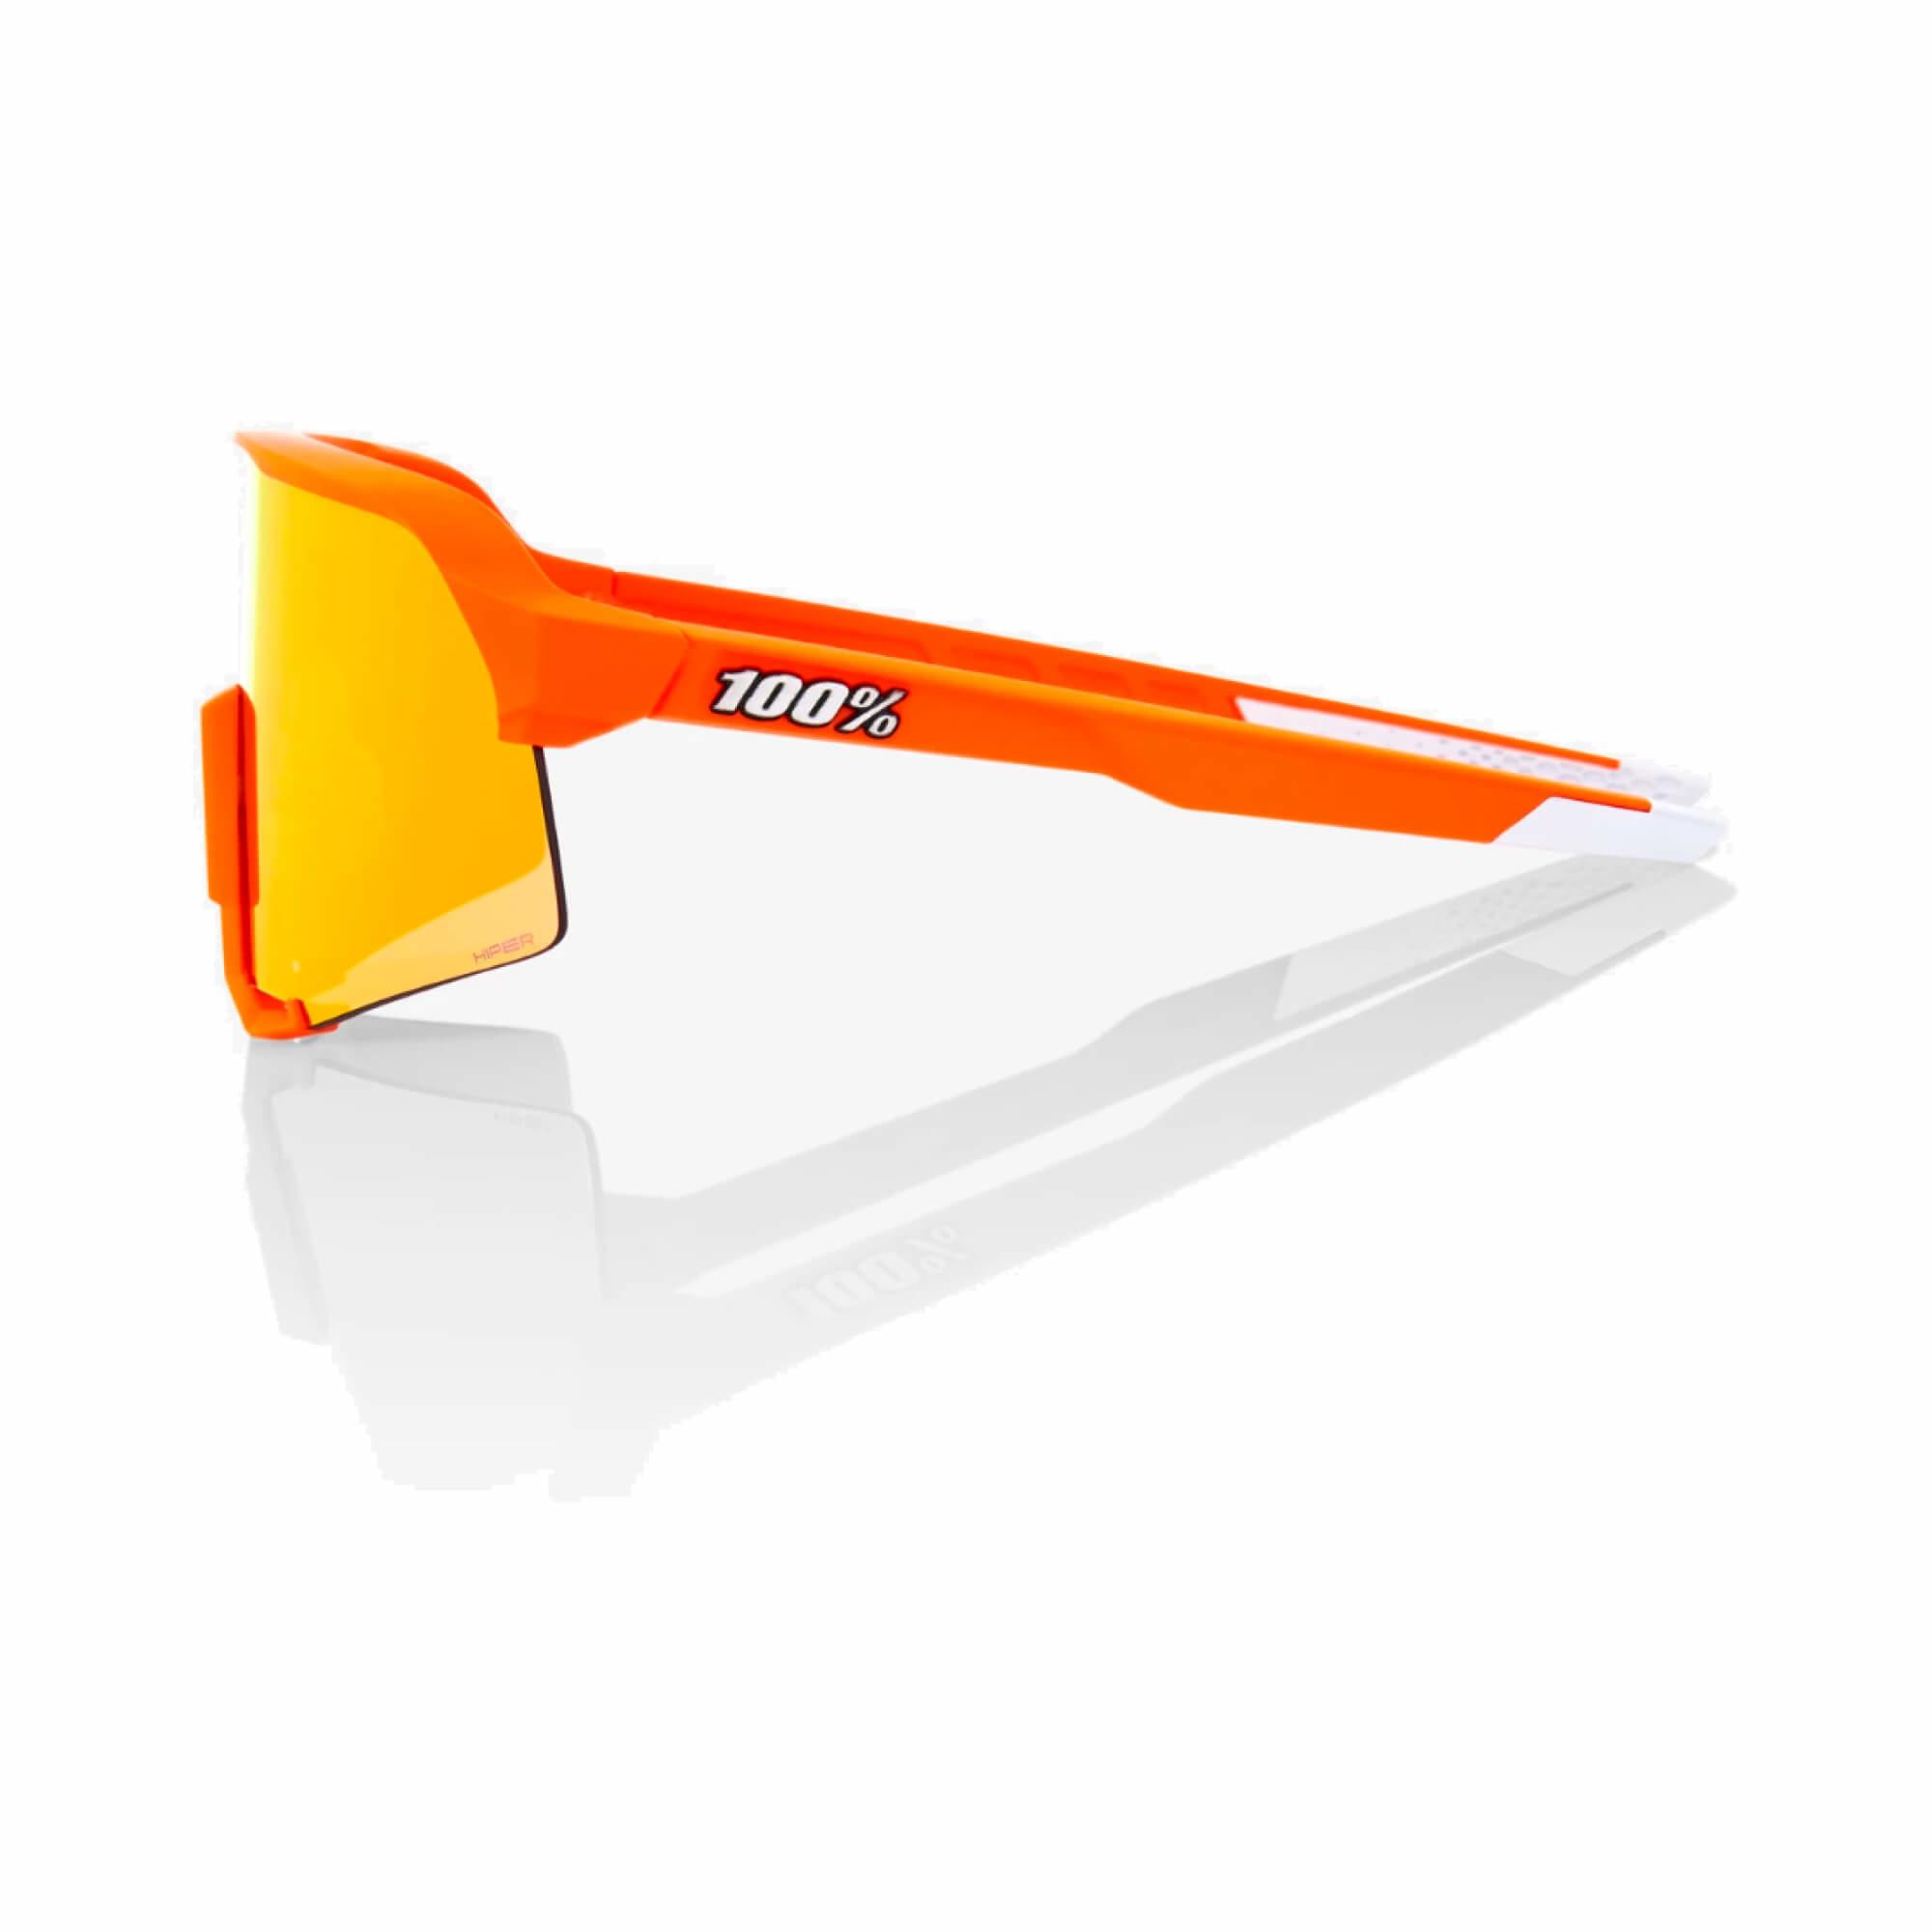 S3 Neon Orange Hyper Red Multilayer-2